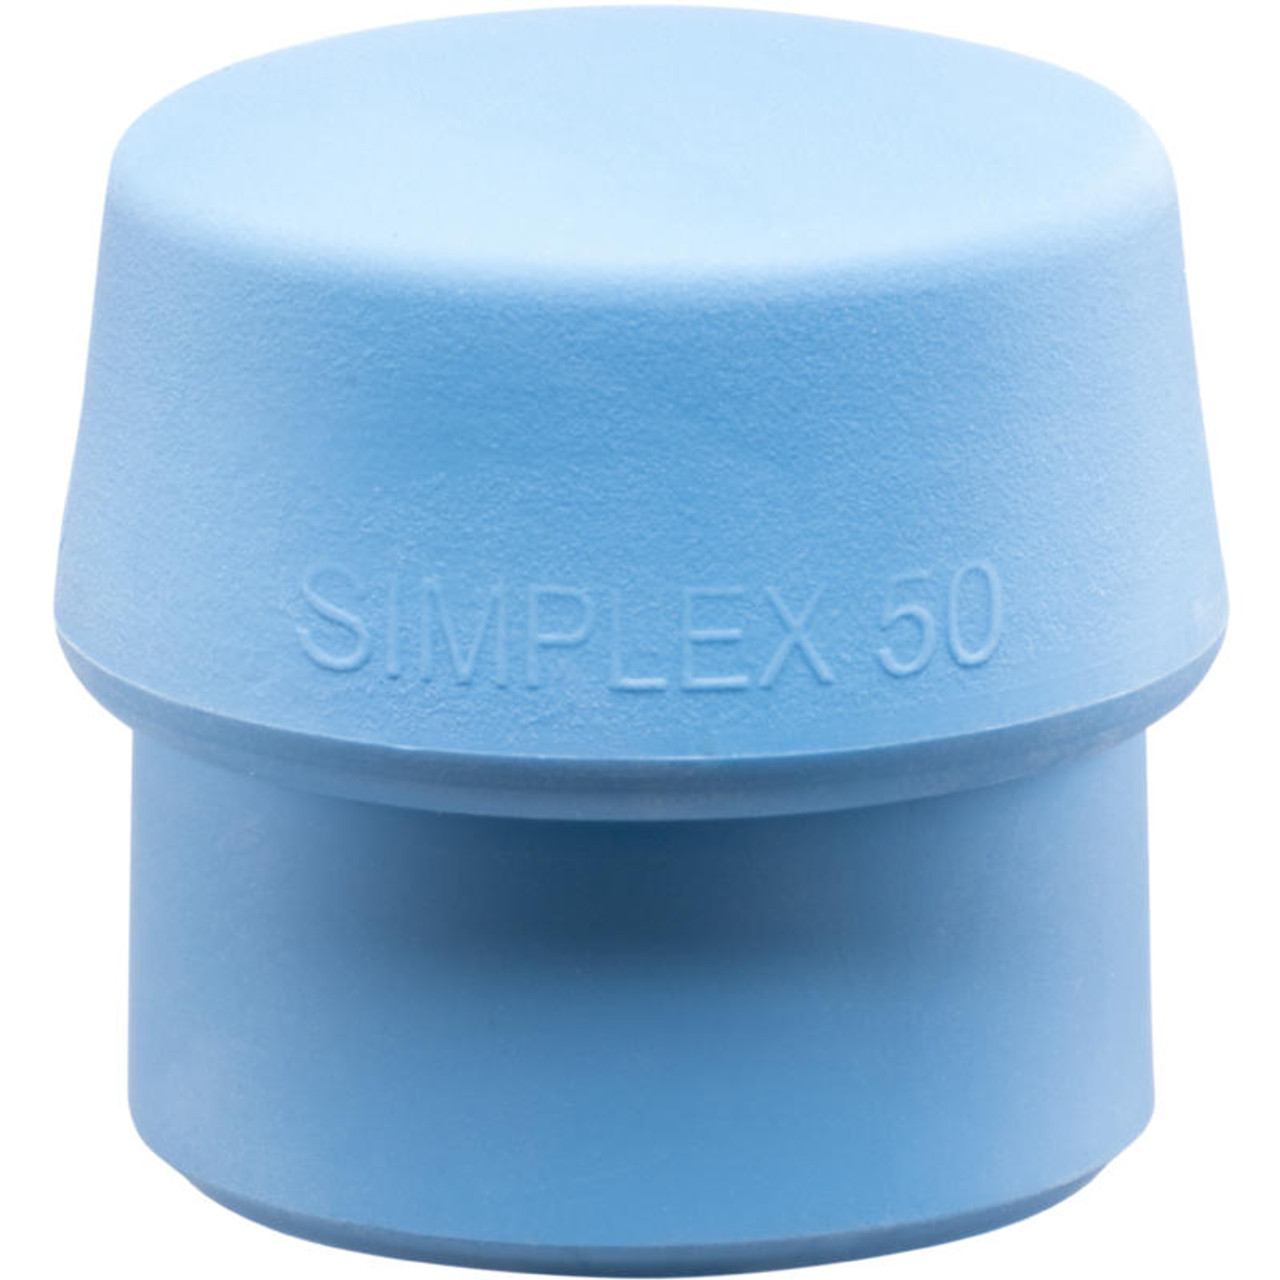 Simplex Replacement Face Insert, Soft Blue Rubber